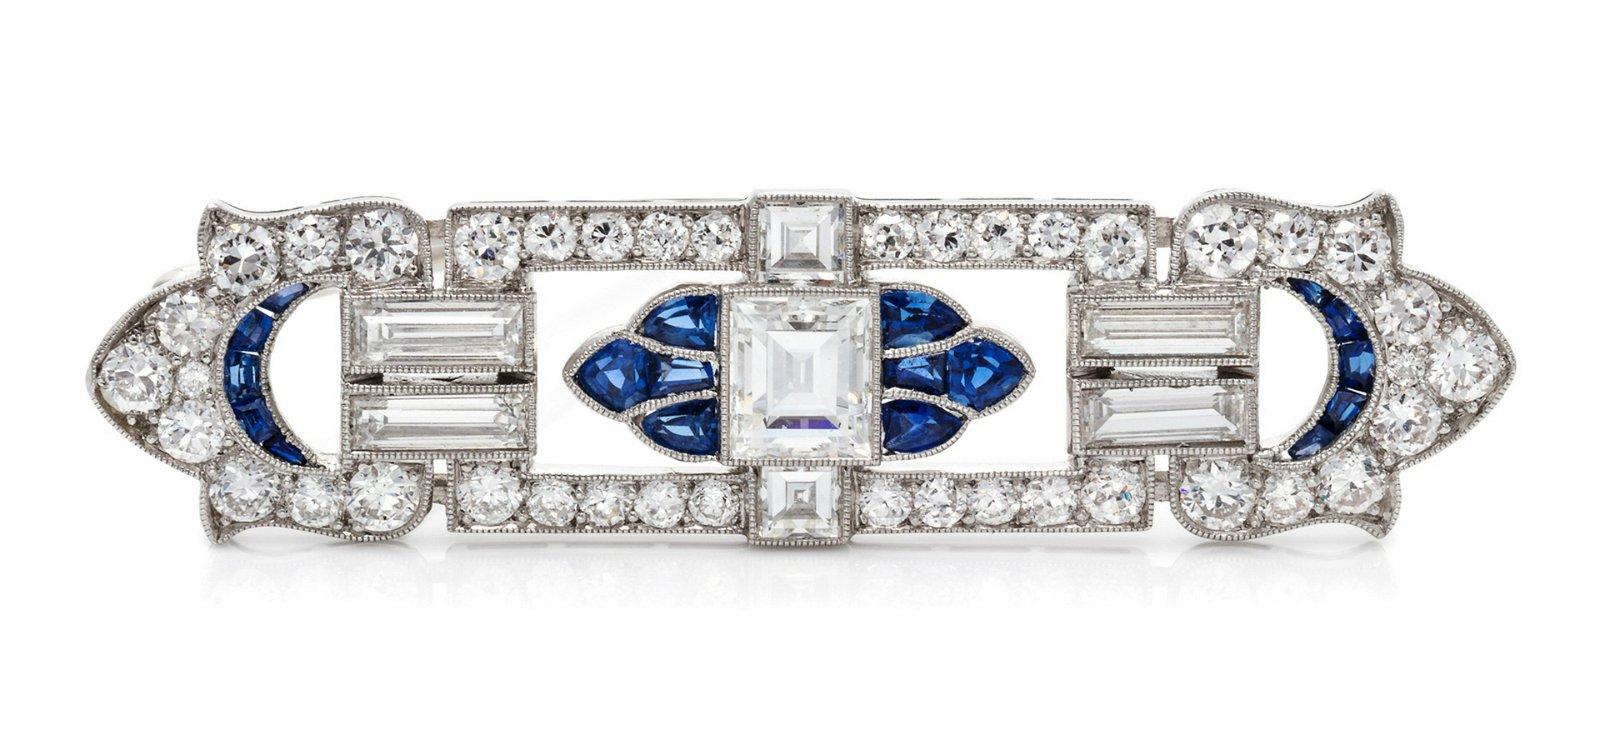 An Art Deco Platinum, Diamond and Sapphire Brooch,